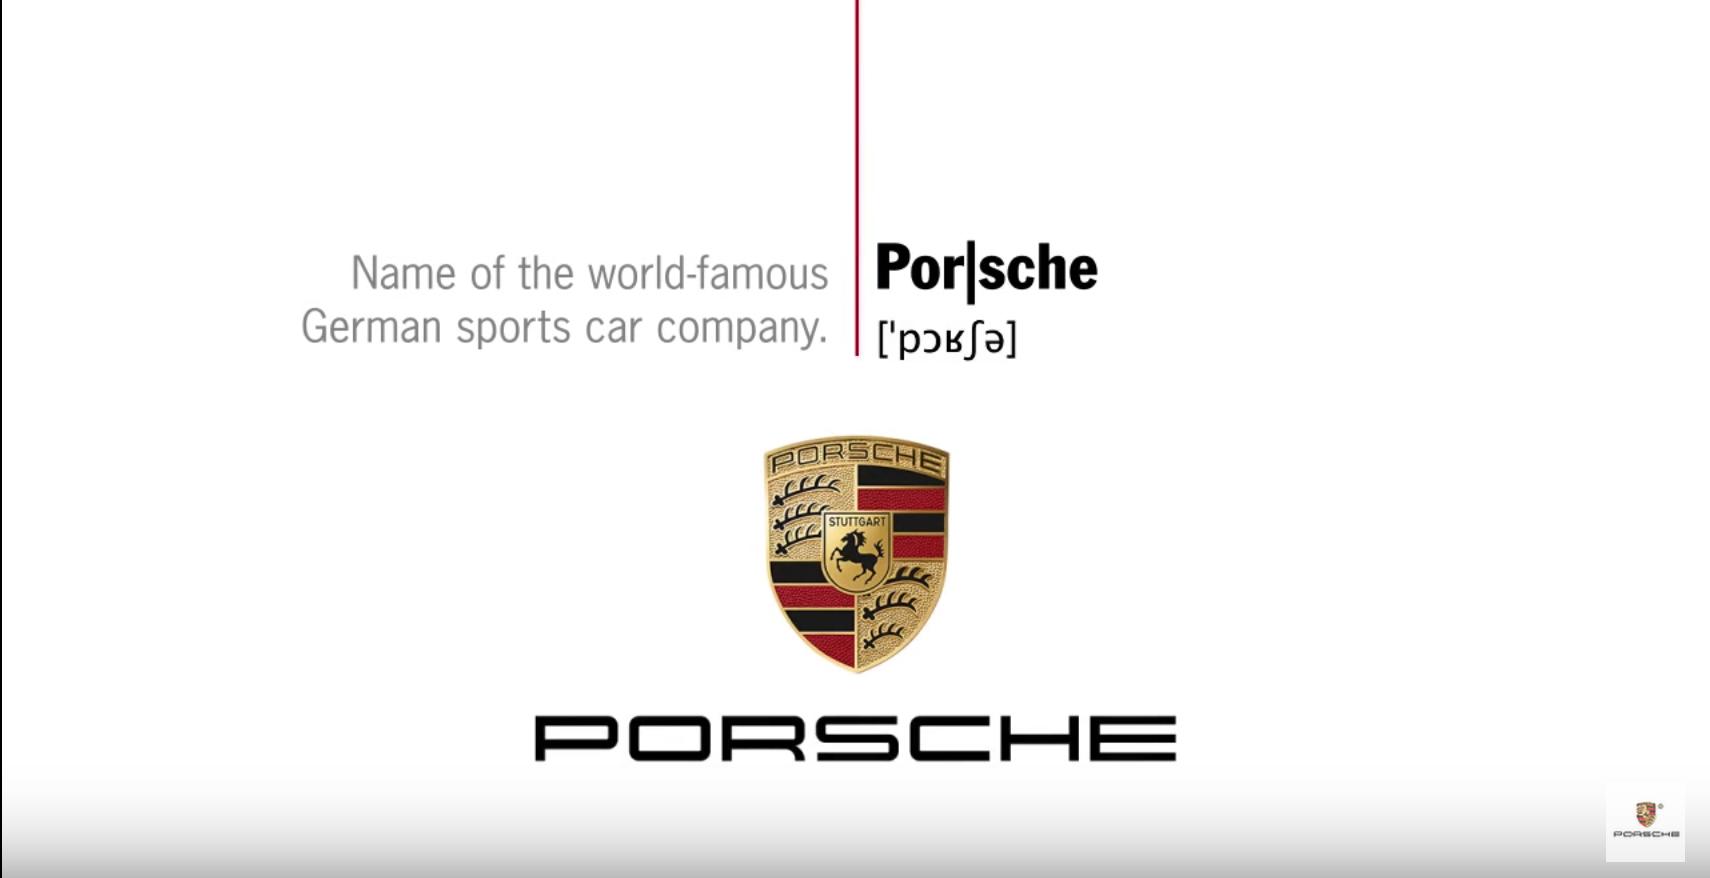 porsche actually made a video on how to pronounce its name